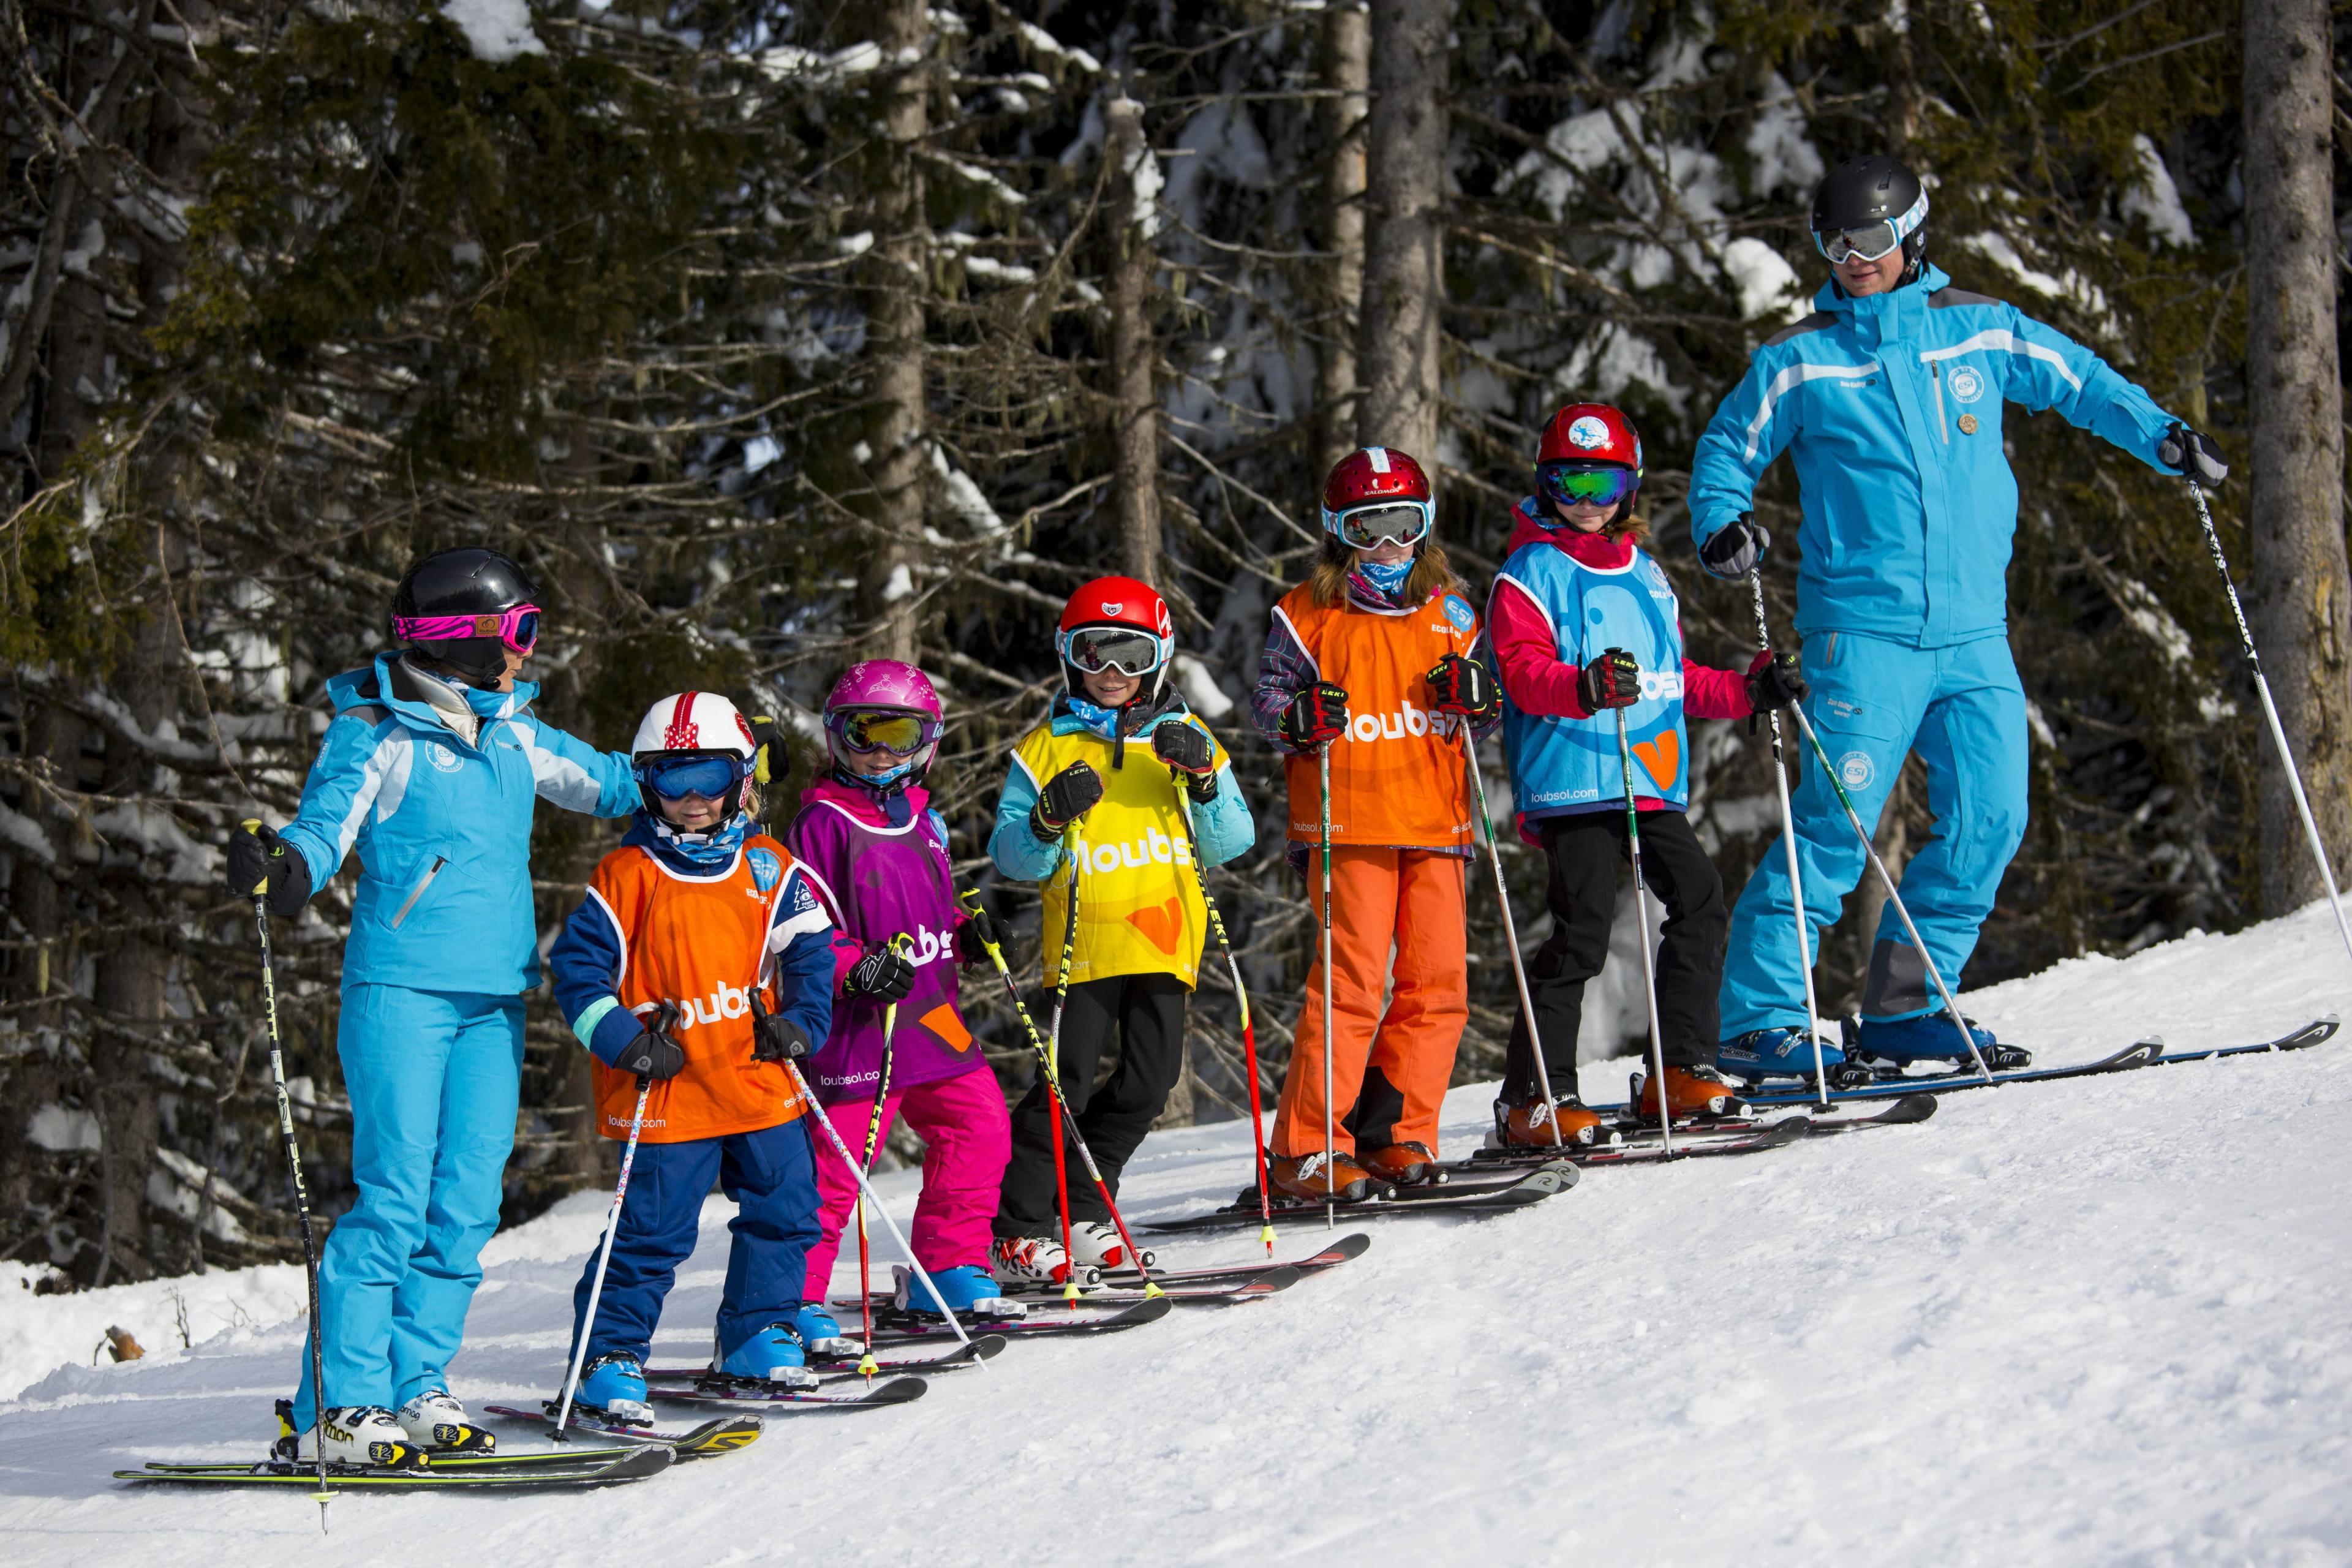 Kids Ski Lessons (6-17 years) - Low Season